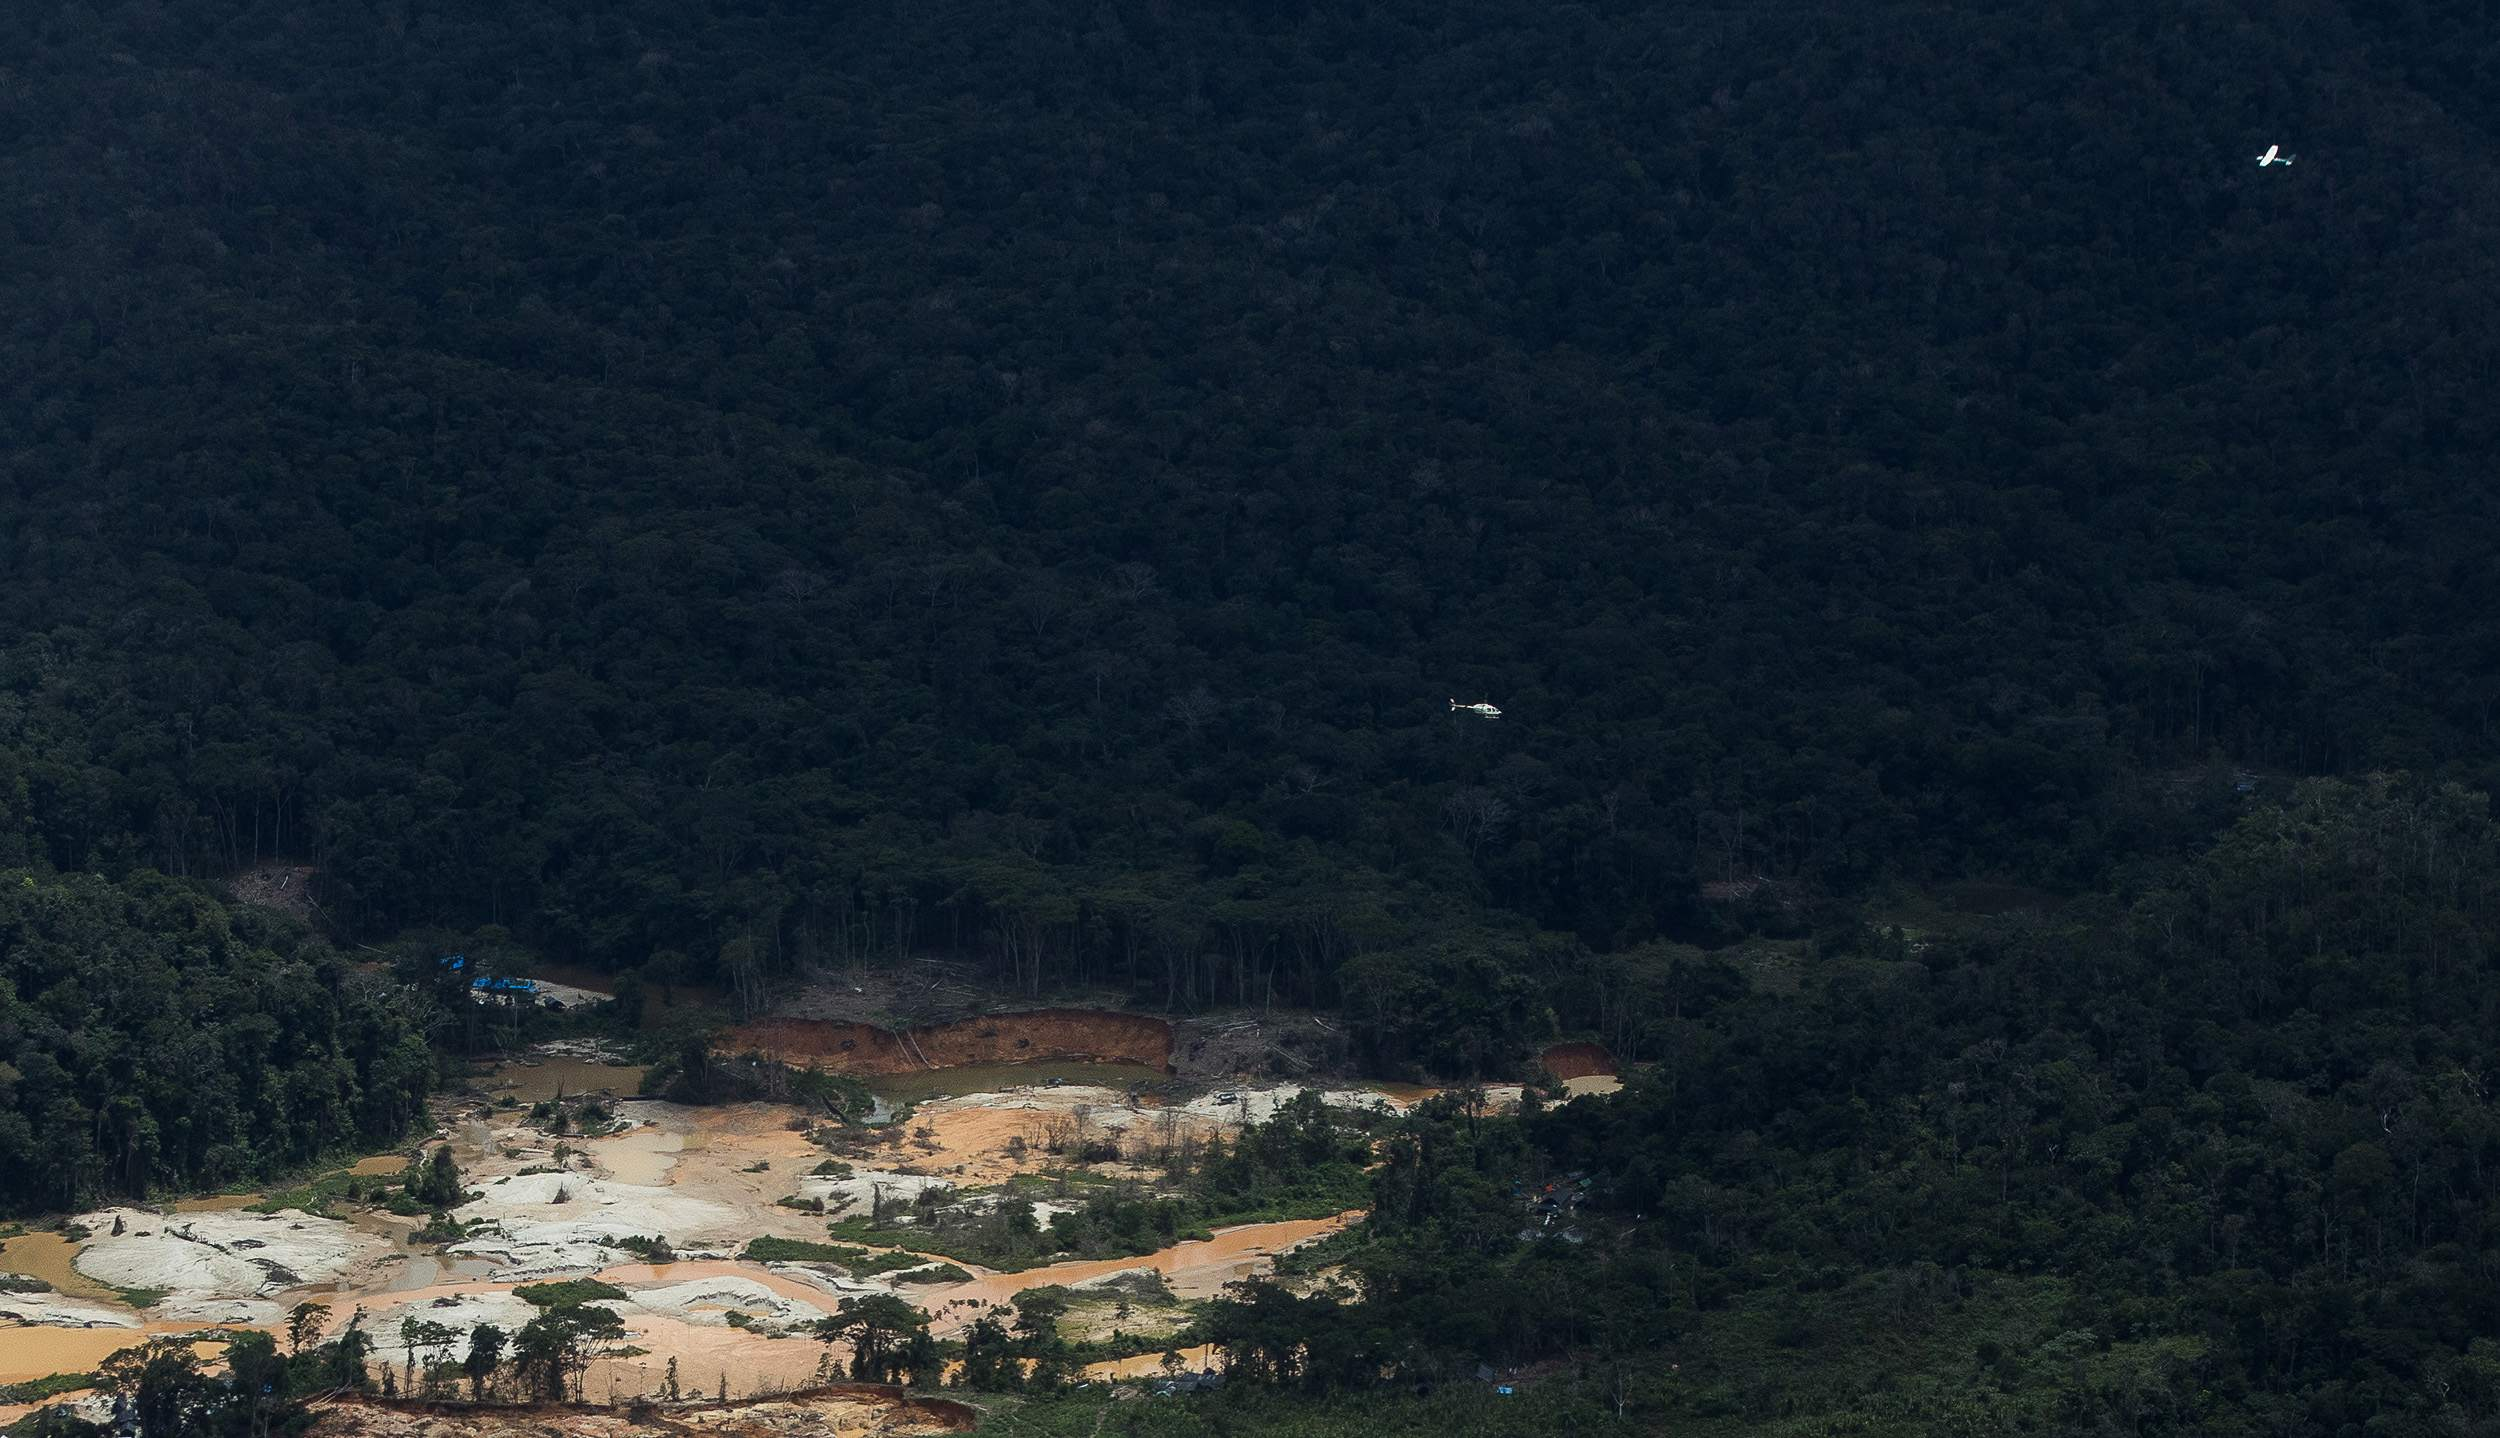 aeronaves sobrevoam garimpo na TI Yanomami (Bruno Kelly)